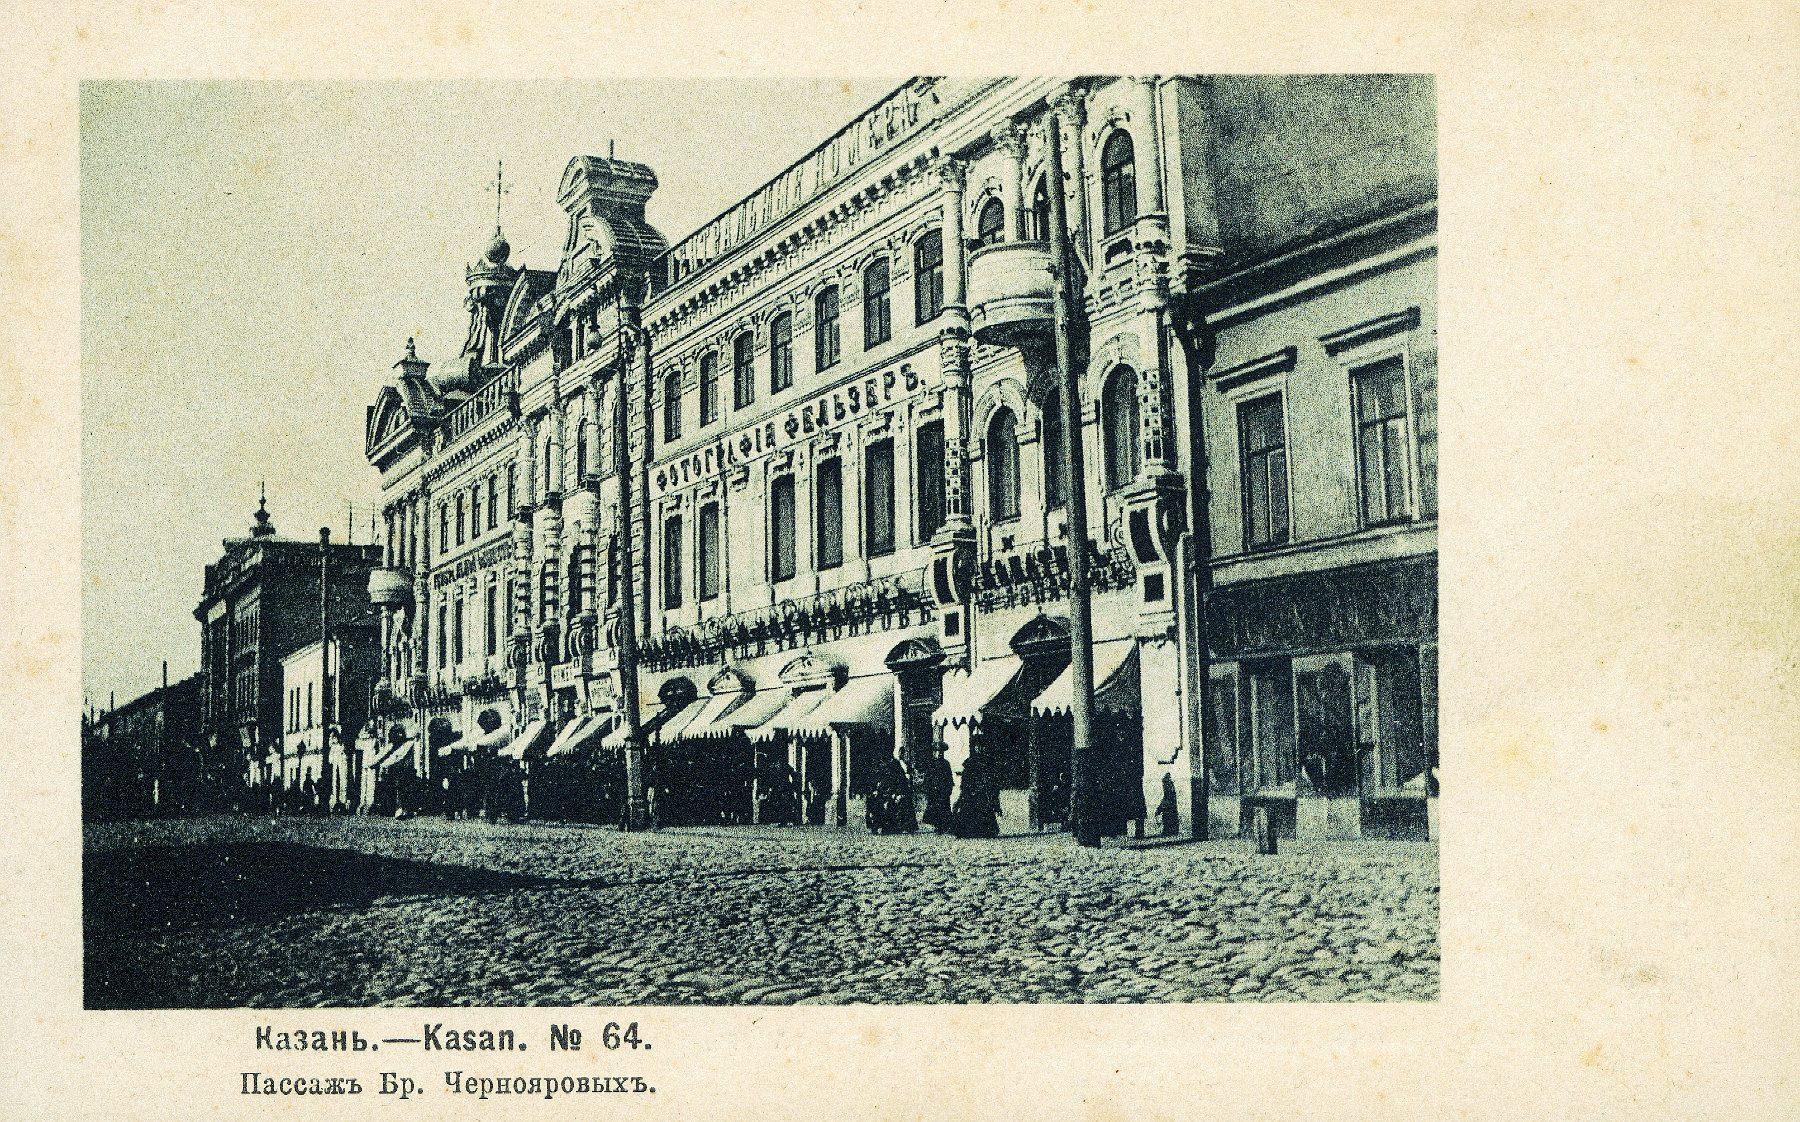 Фото: Kazan Nostalgique